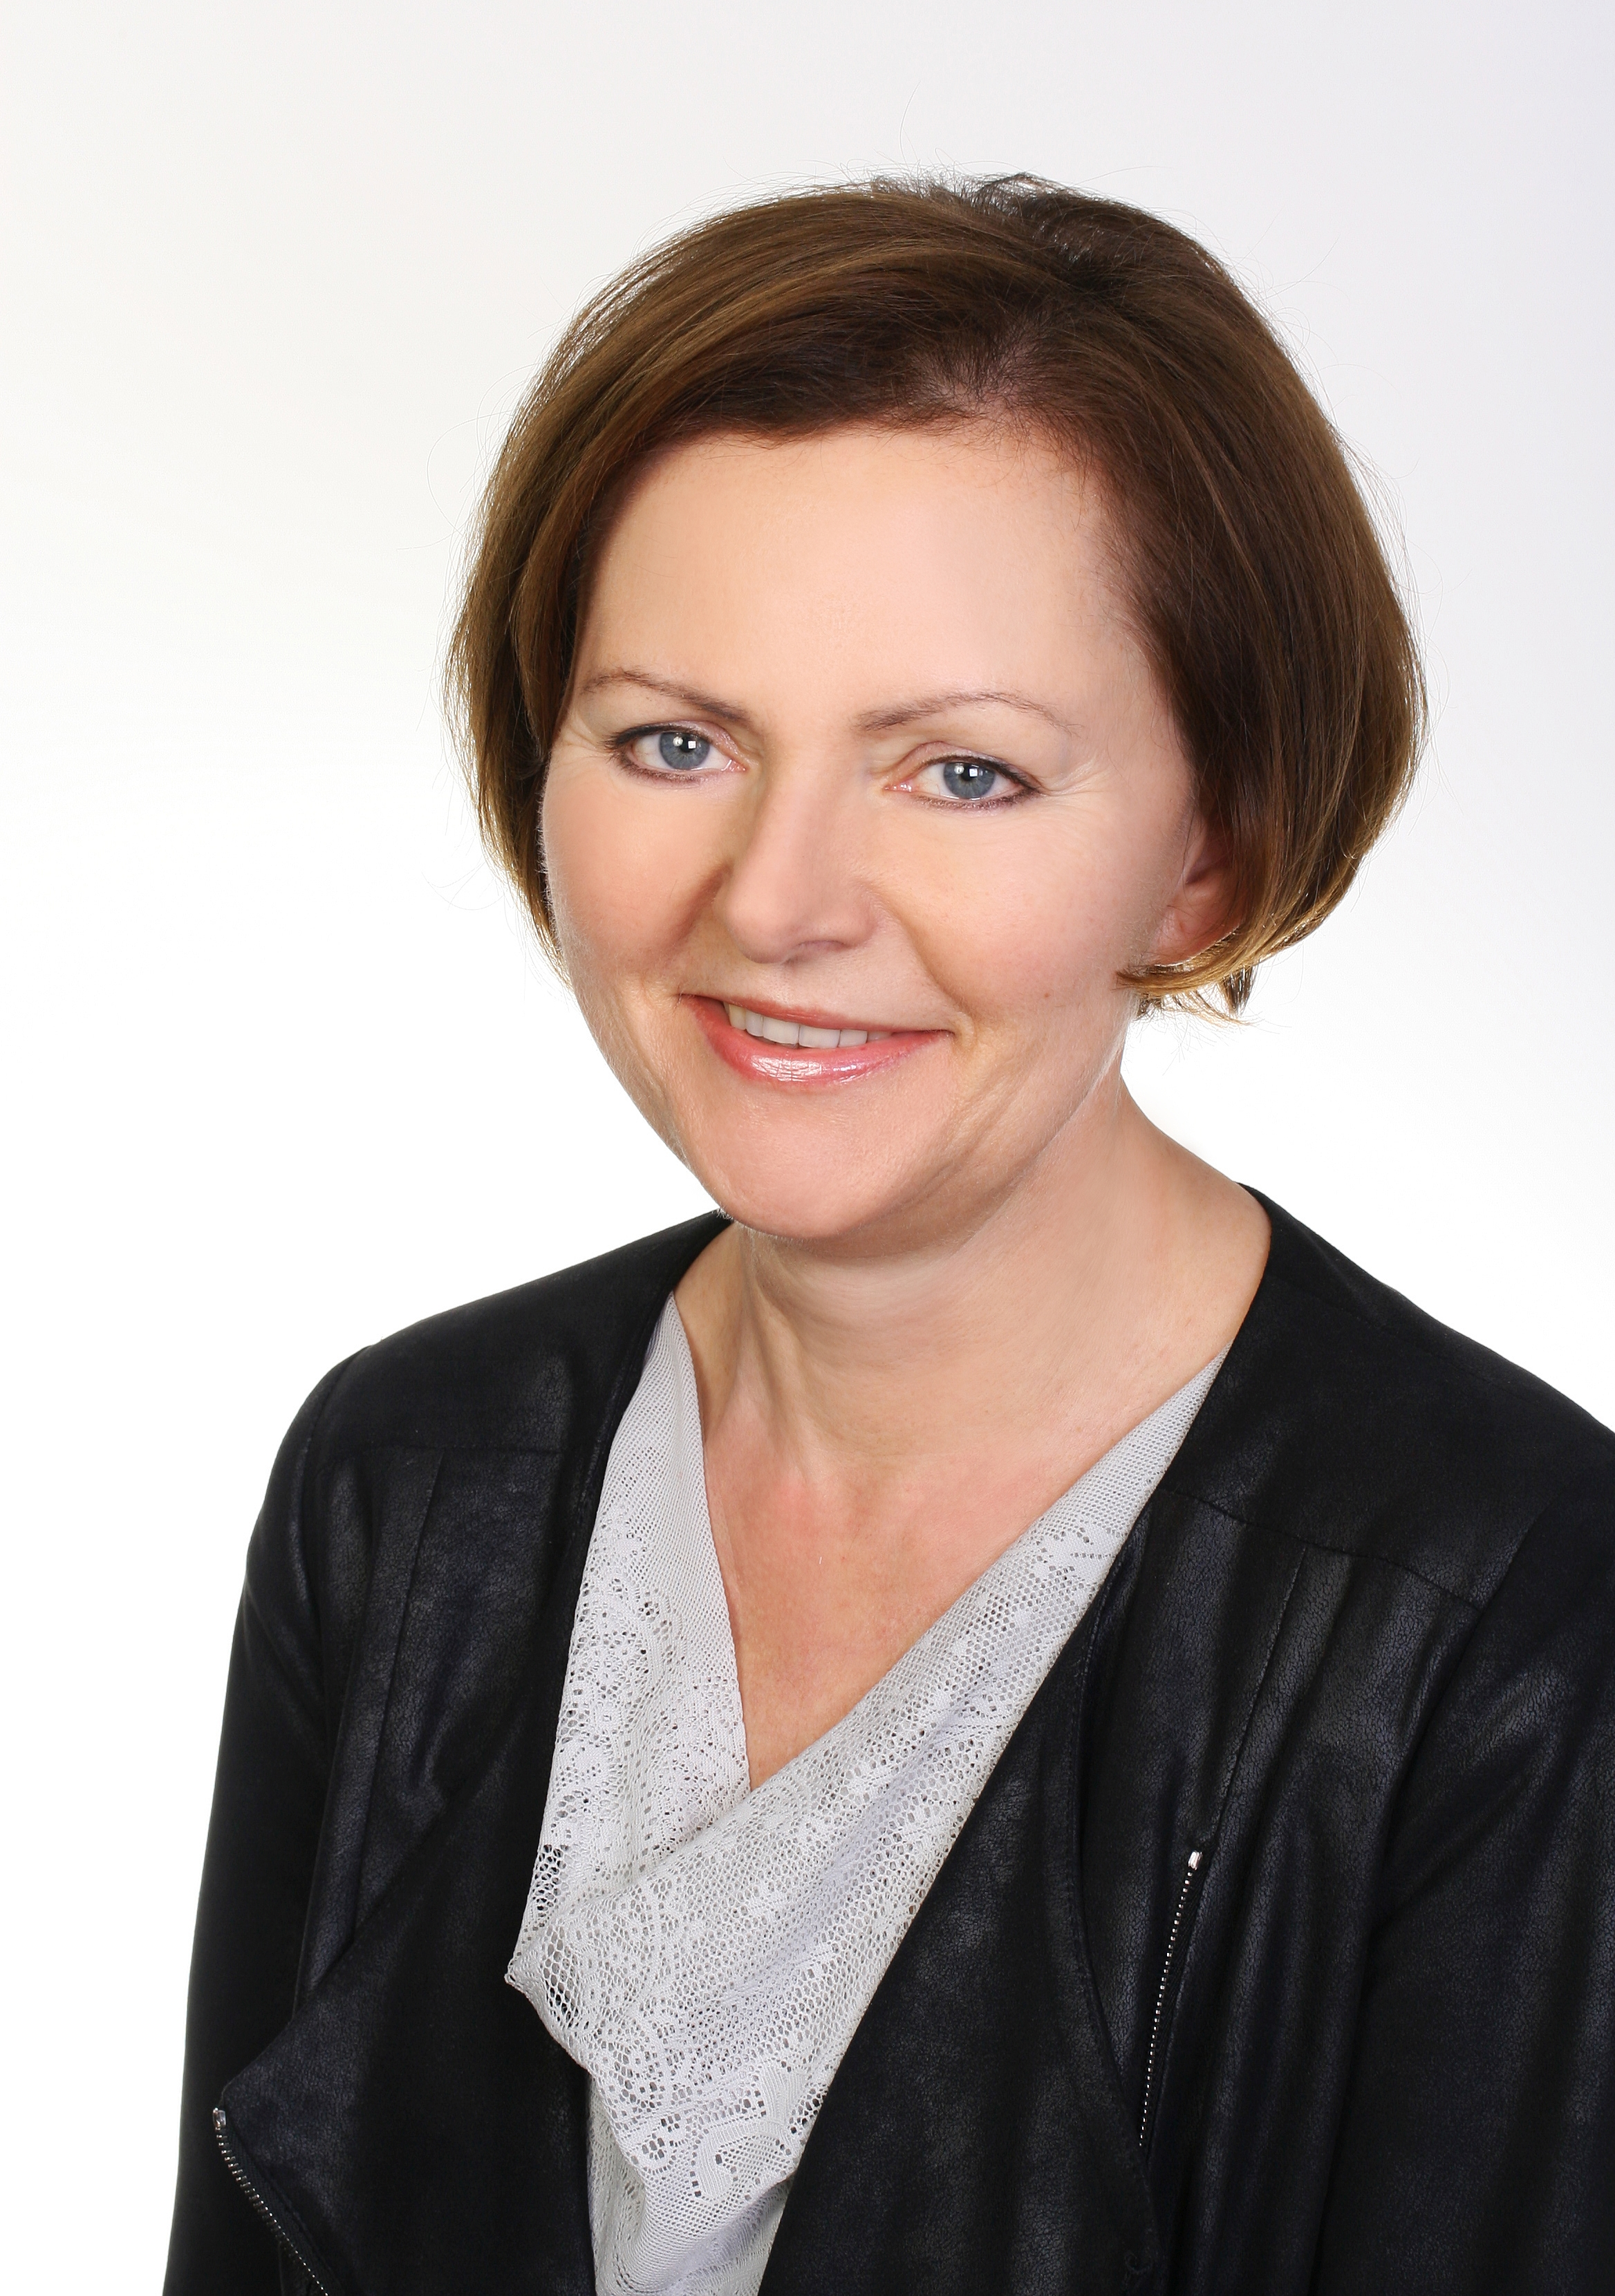 Kierownik Kliniki: dr hab. n. med. Anna Sinkiewicz